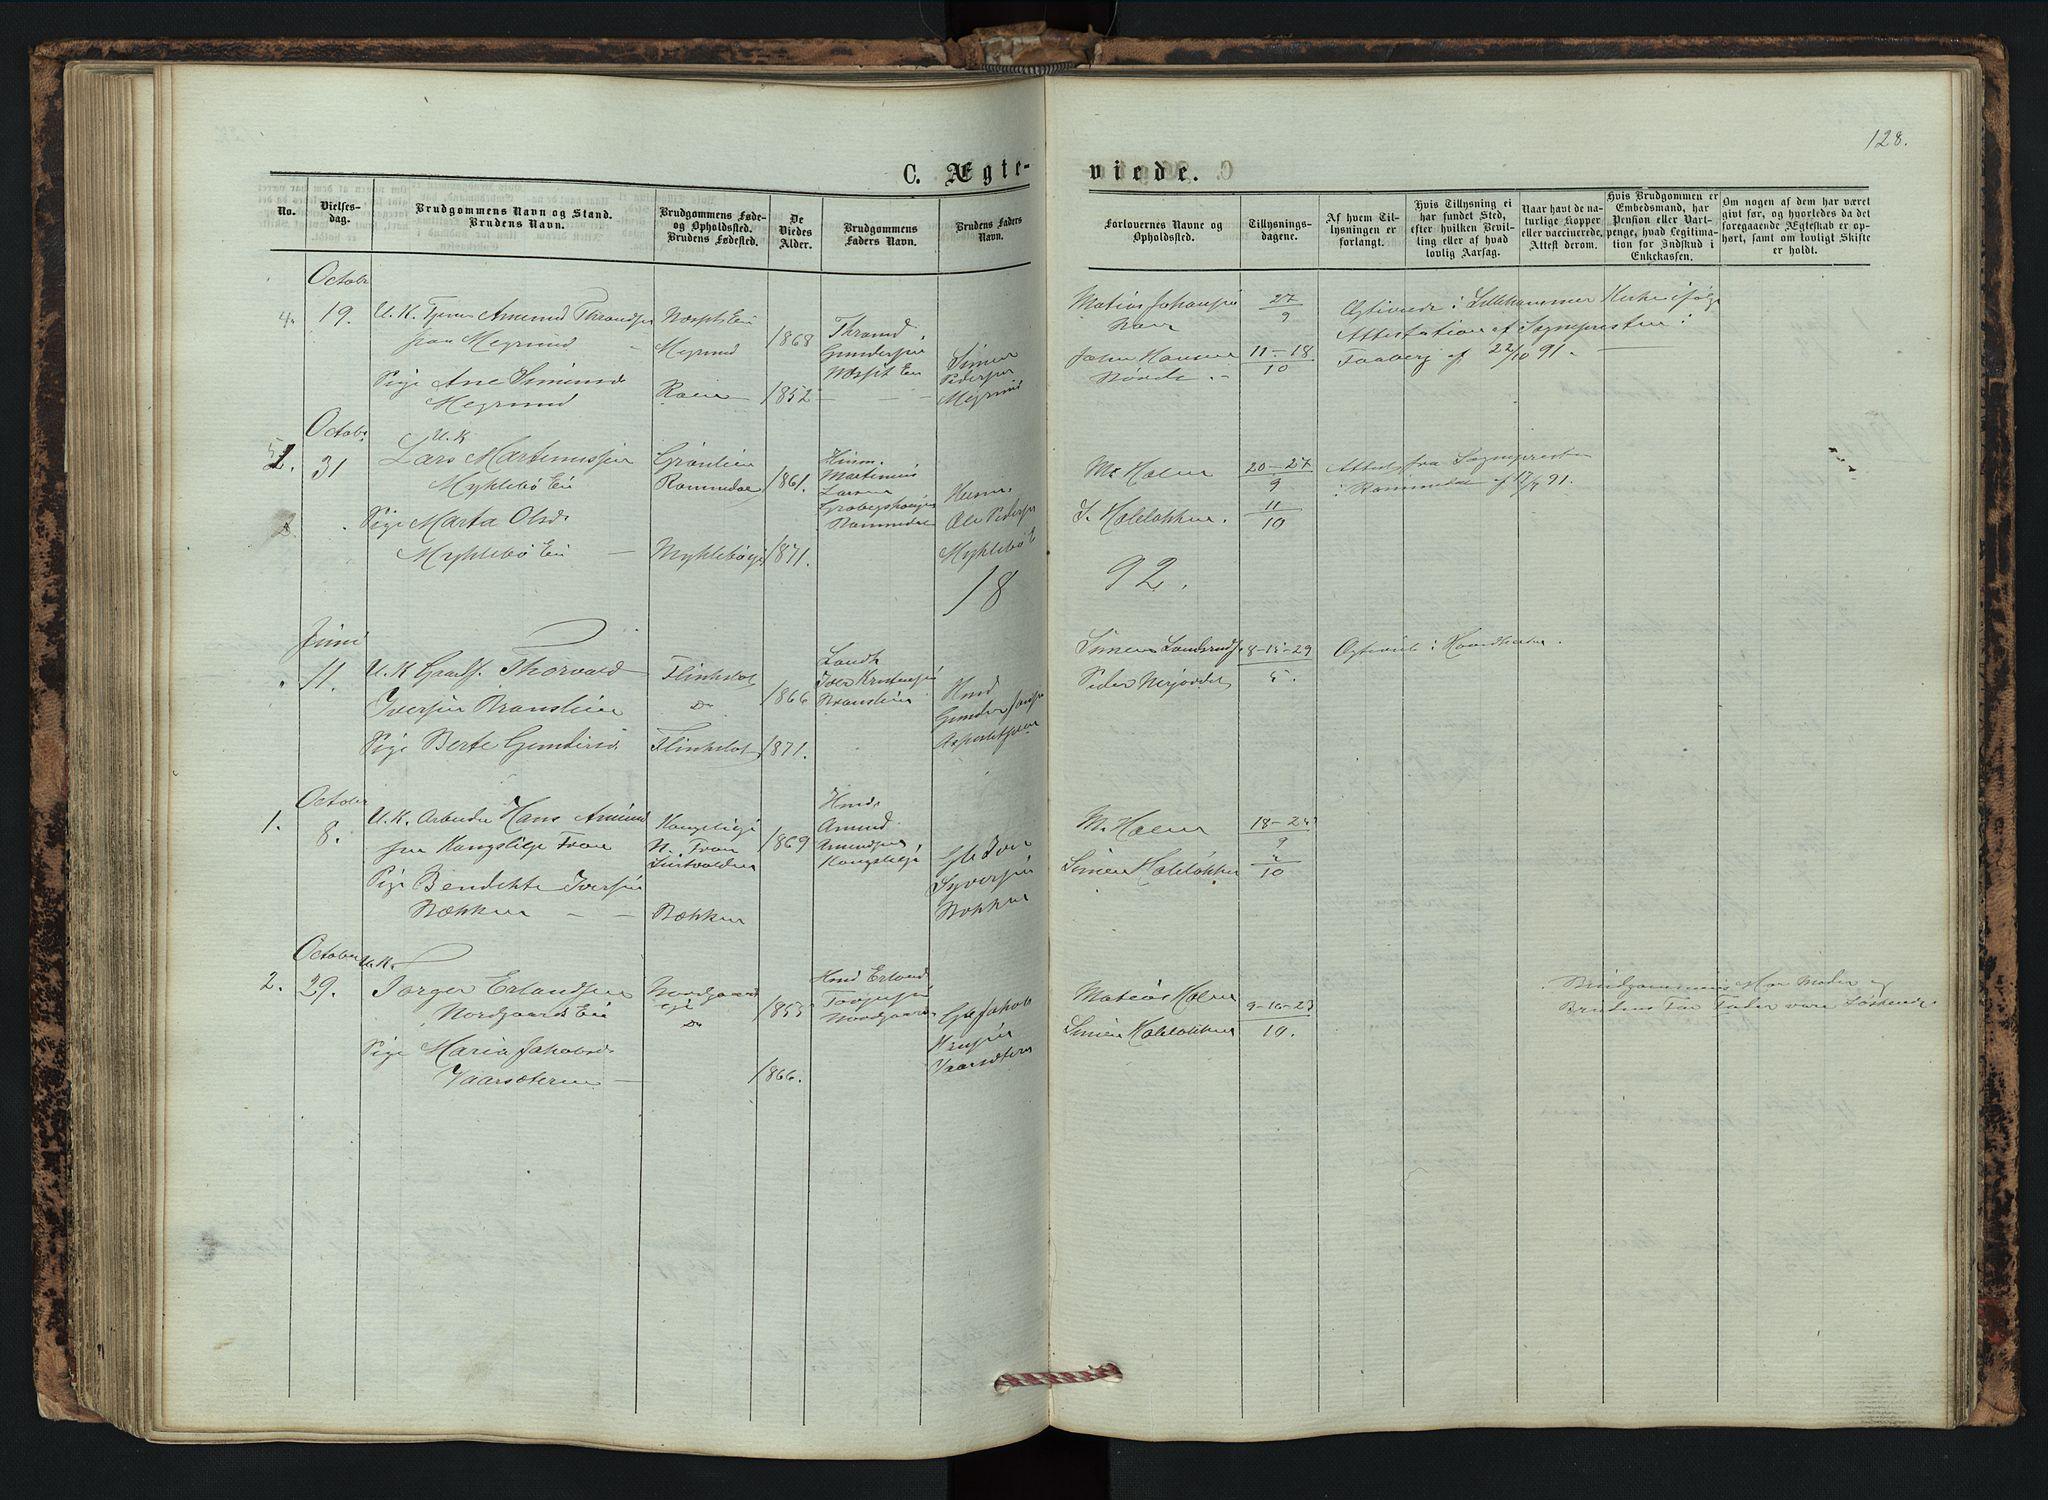 SAH, Vestre Gausdal prestekontor, Klokkerbok nr. 2, 1874-1897, s. 128